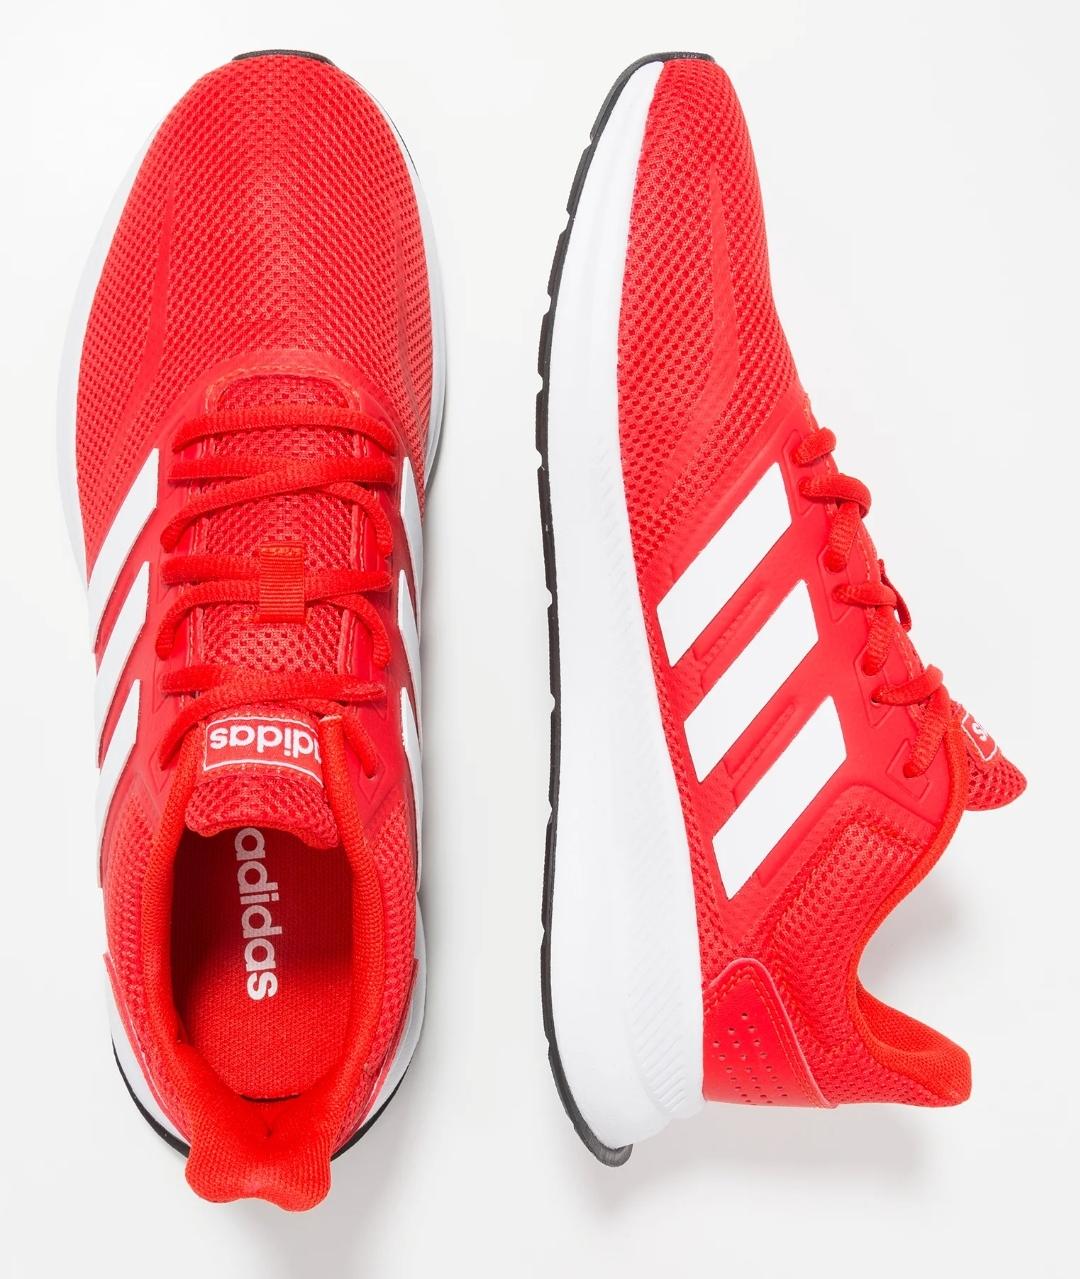 Men's Adidas Runfalcon running shoes